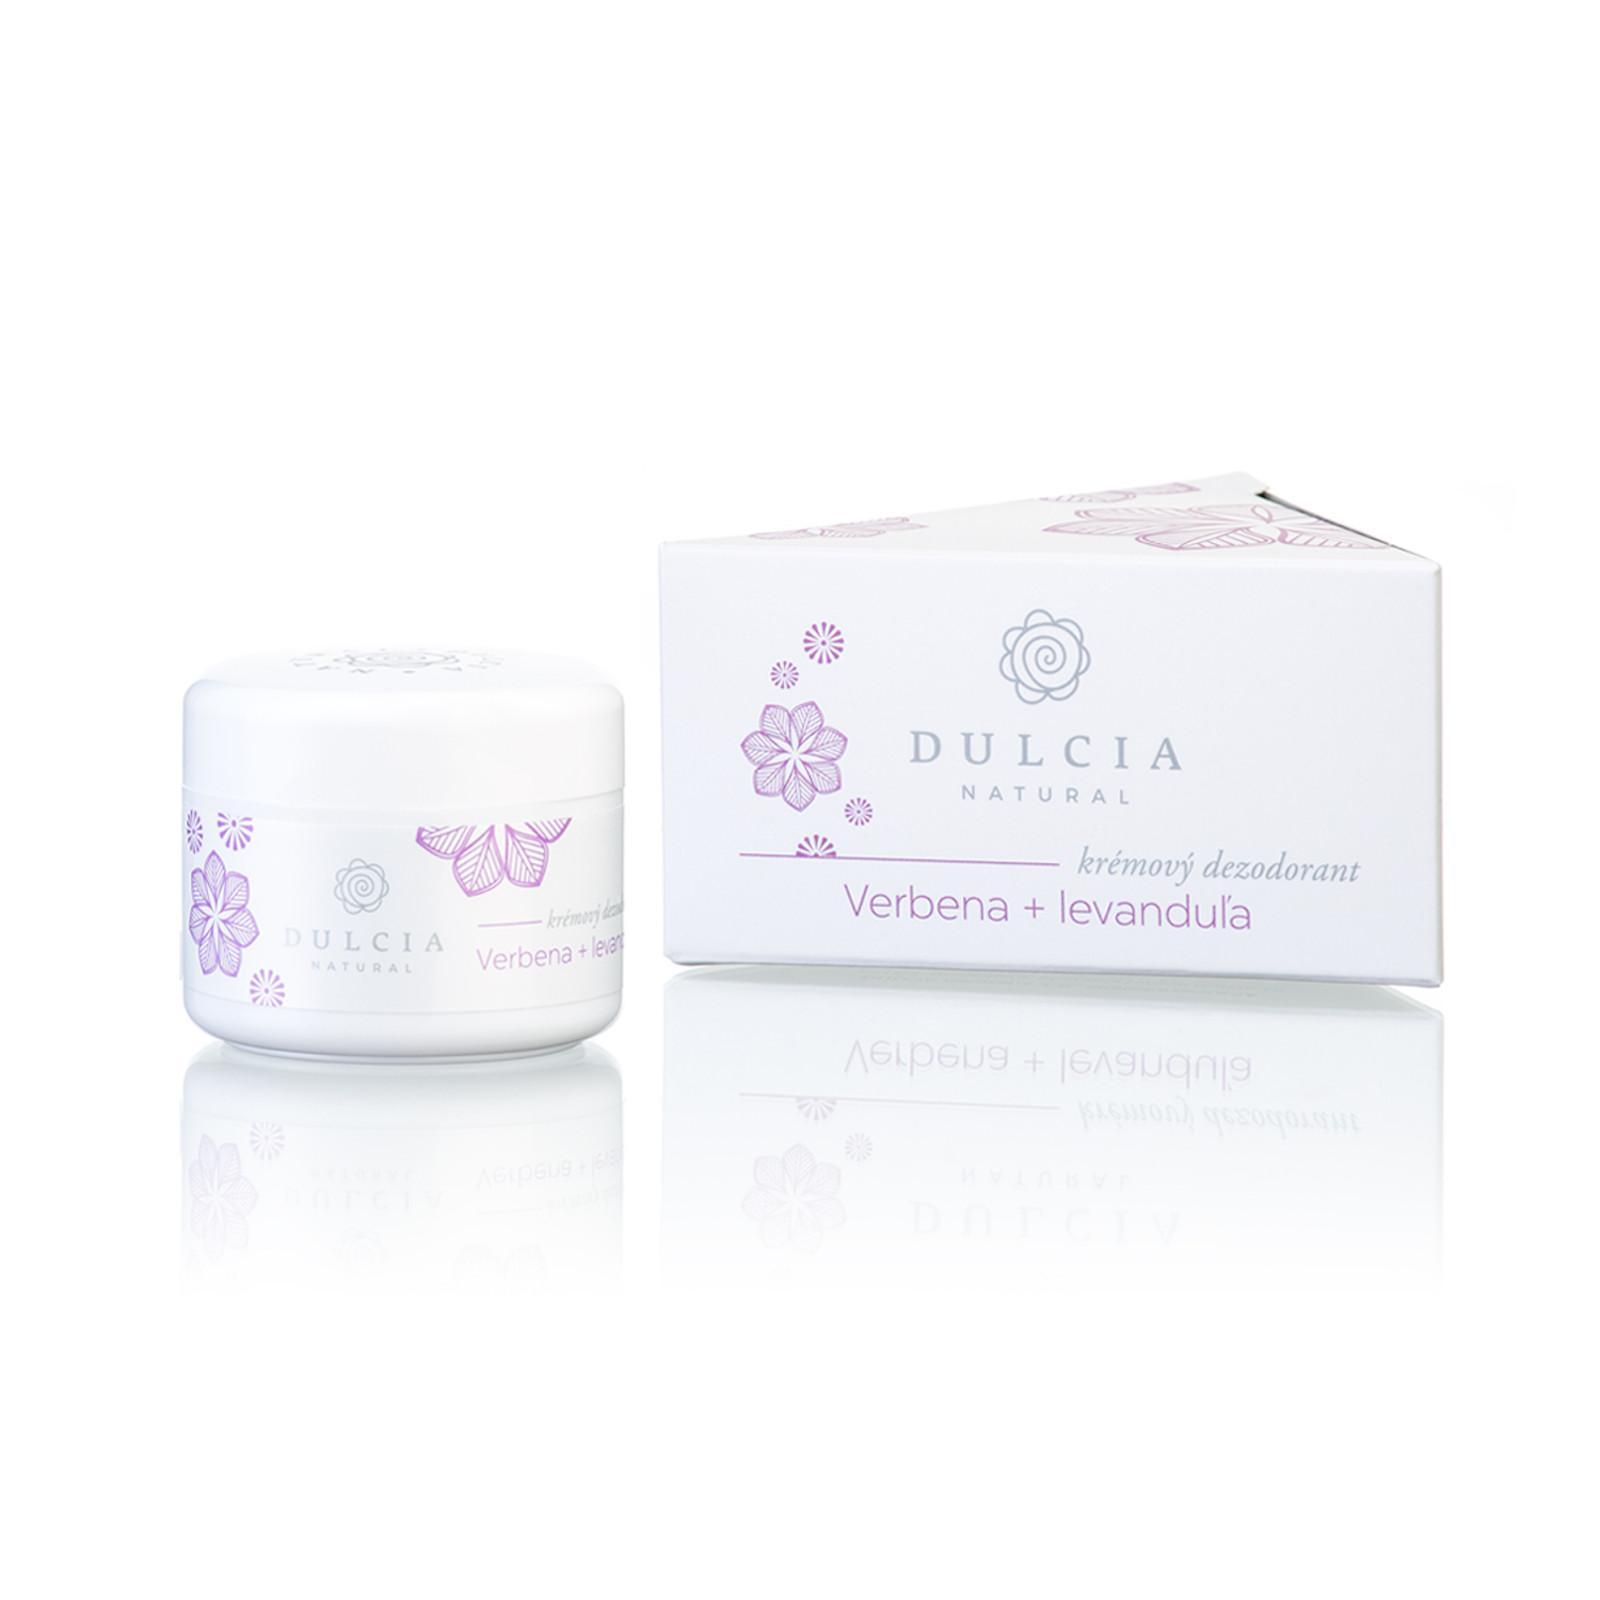 DULCIA natural Krémový deodorant verbena - levandule 30 ml